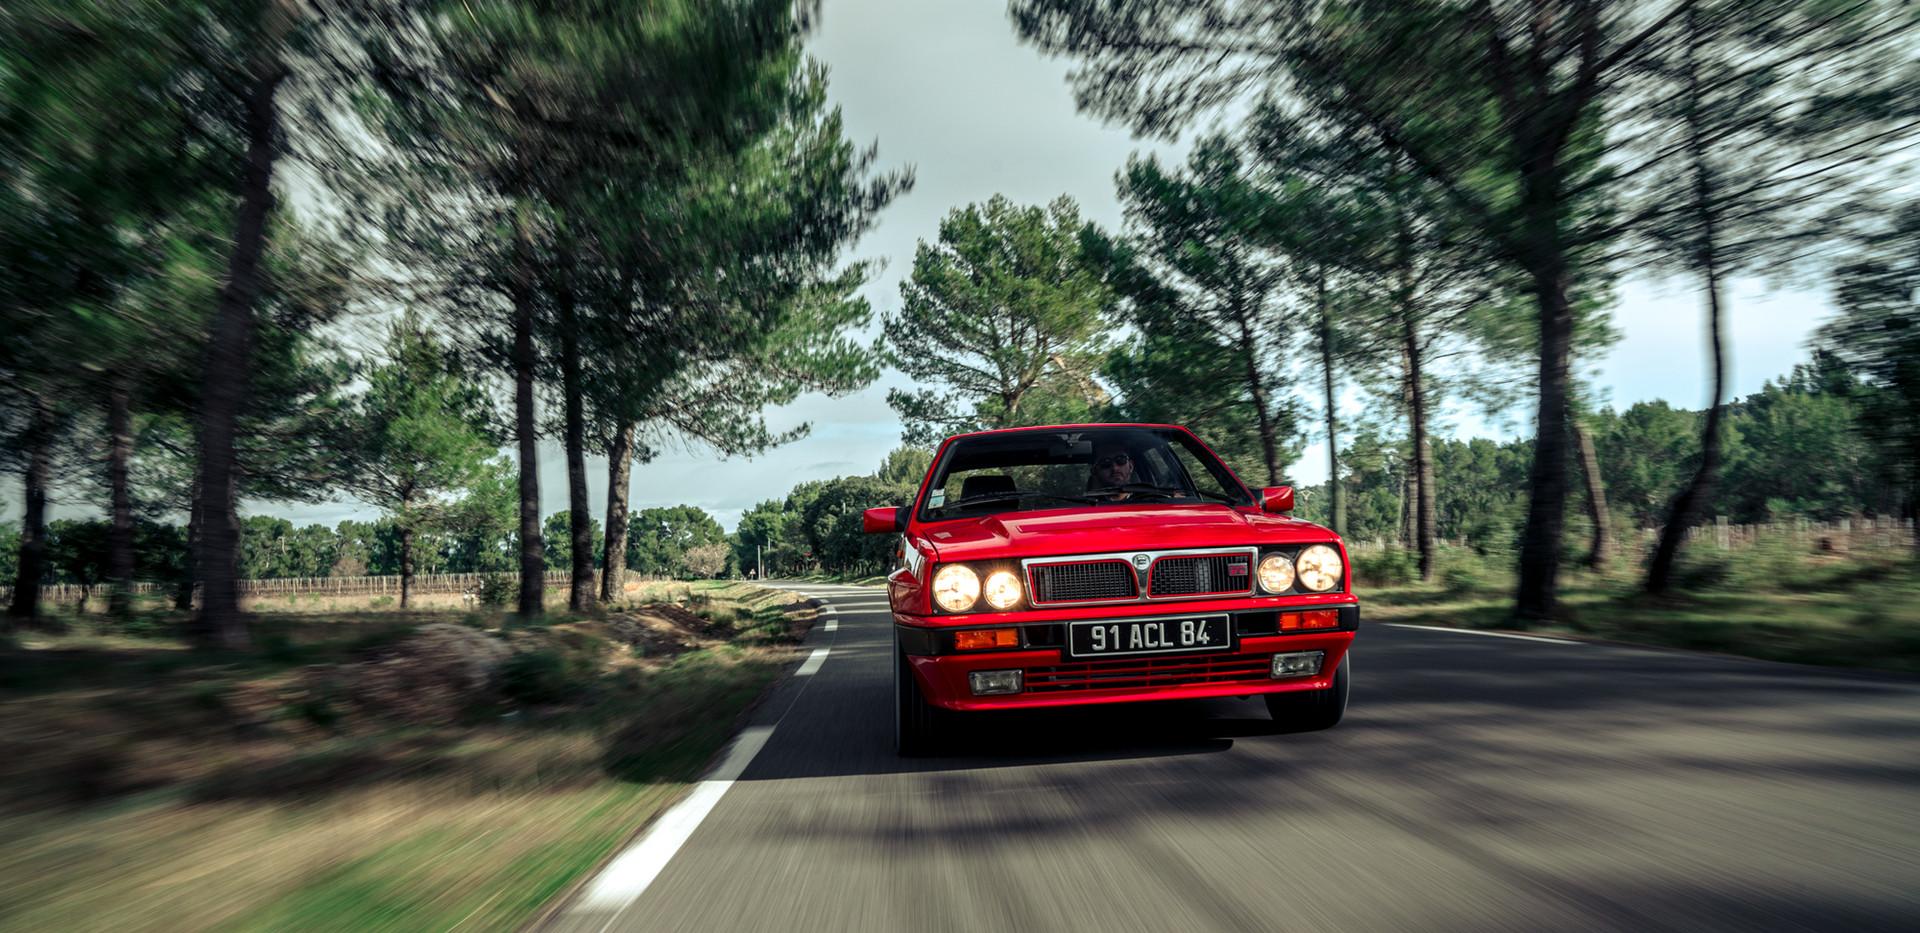 Lancia Delta Integrale 16V 1989